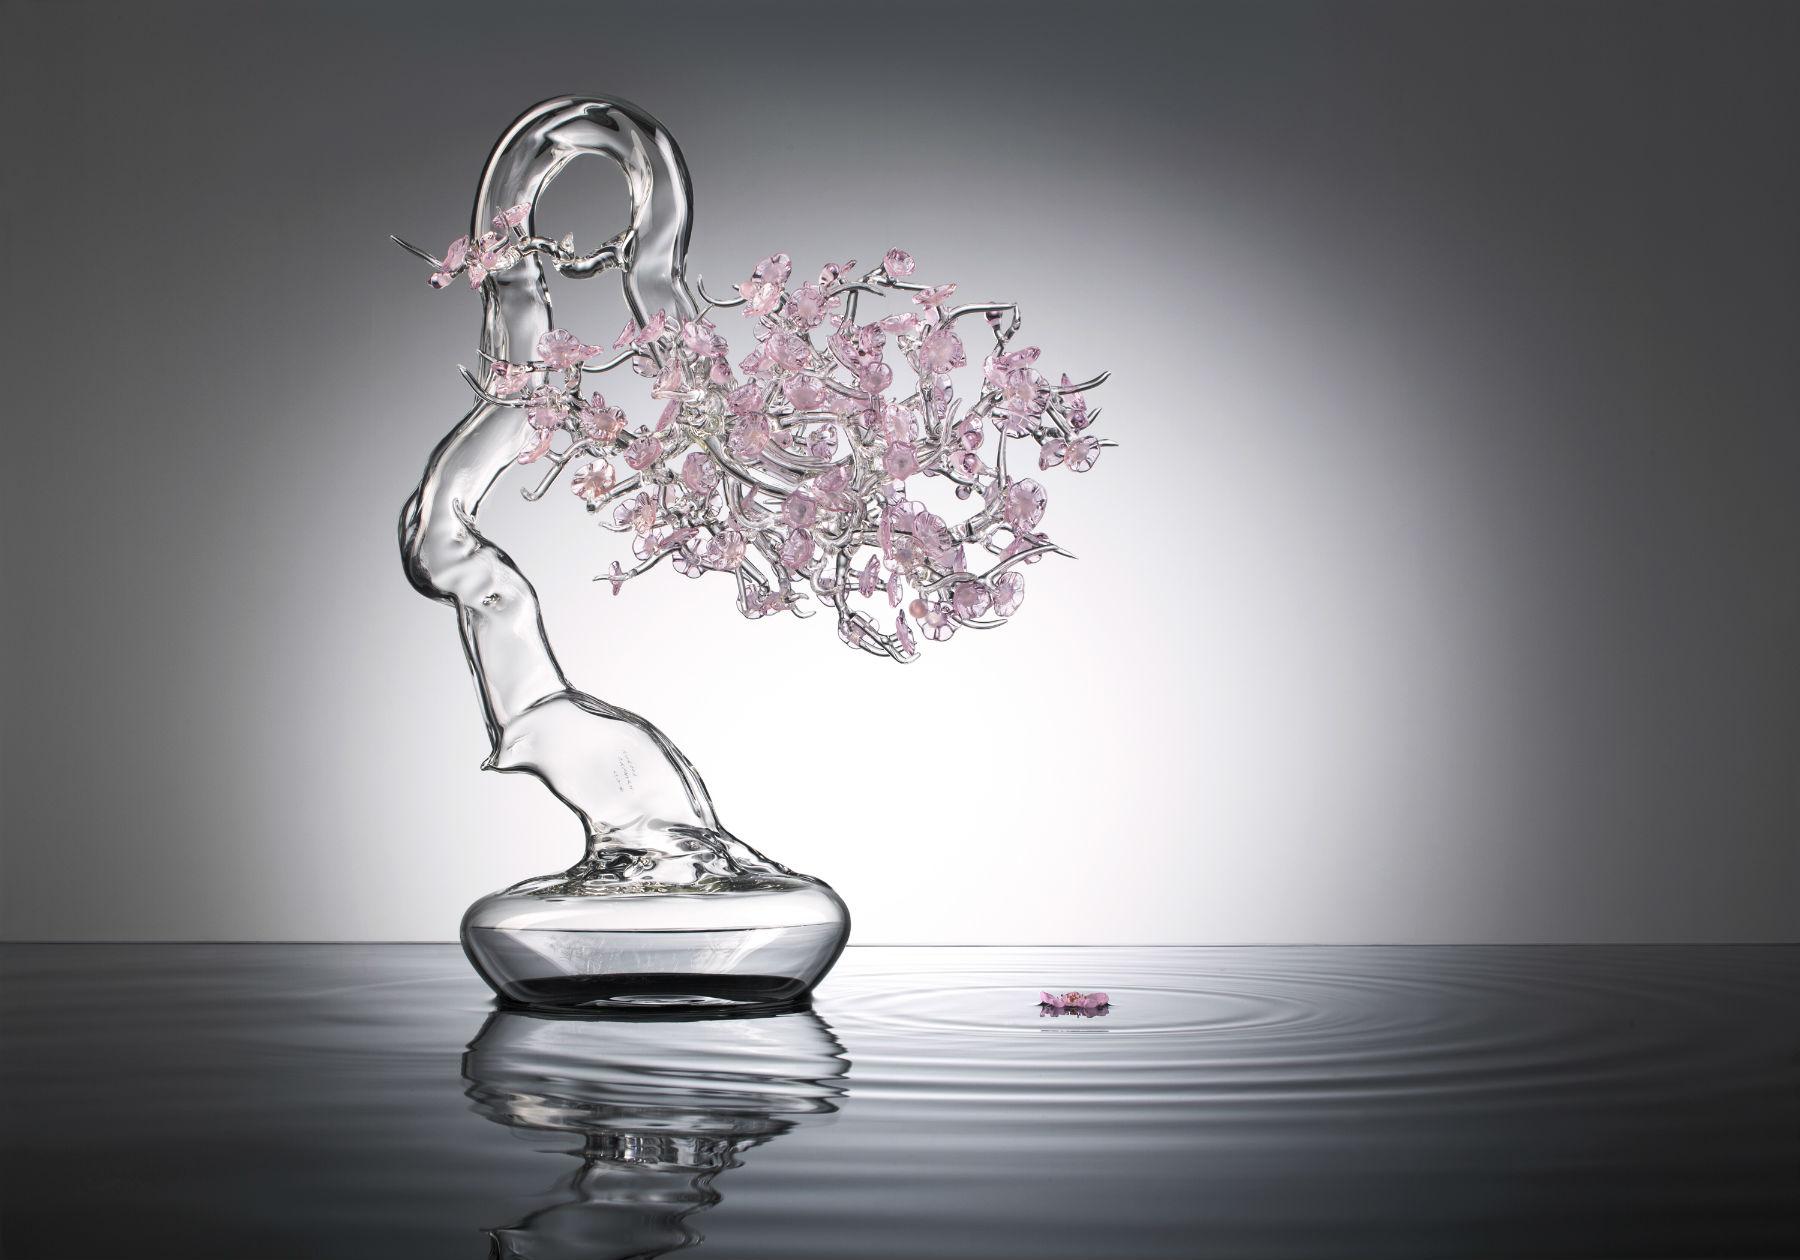 Simone_Crestani_bonsai_Sakura (1)